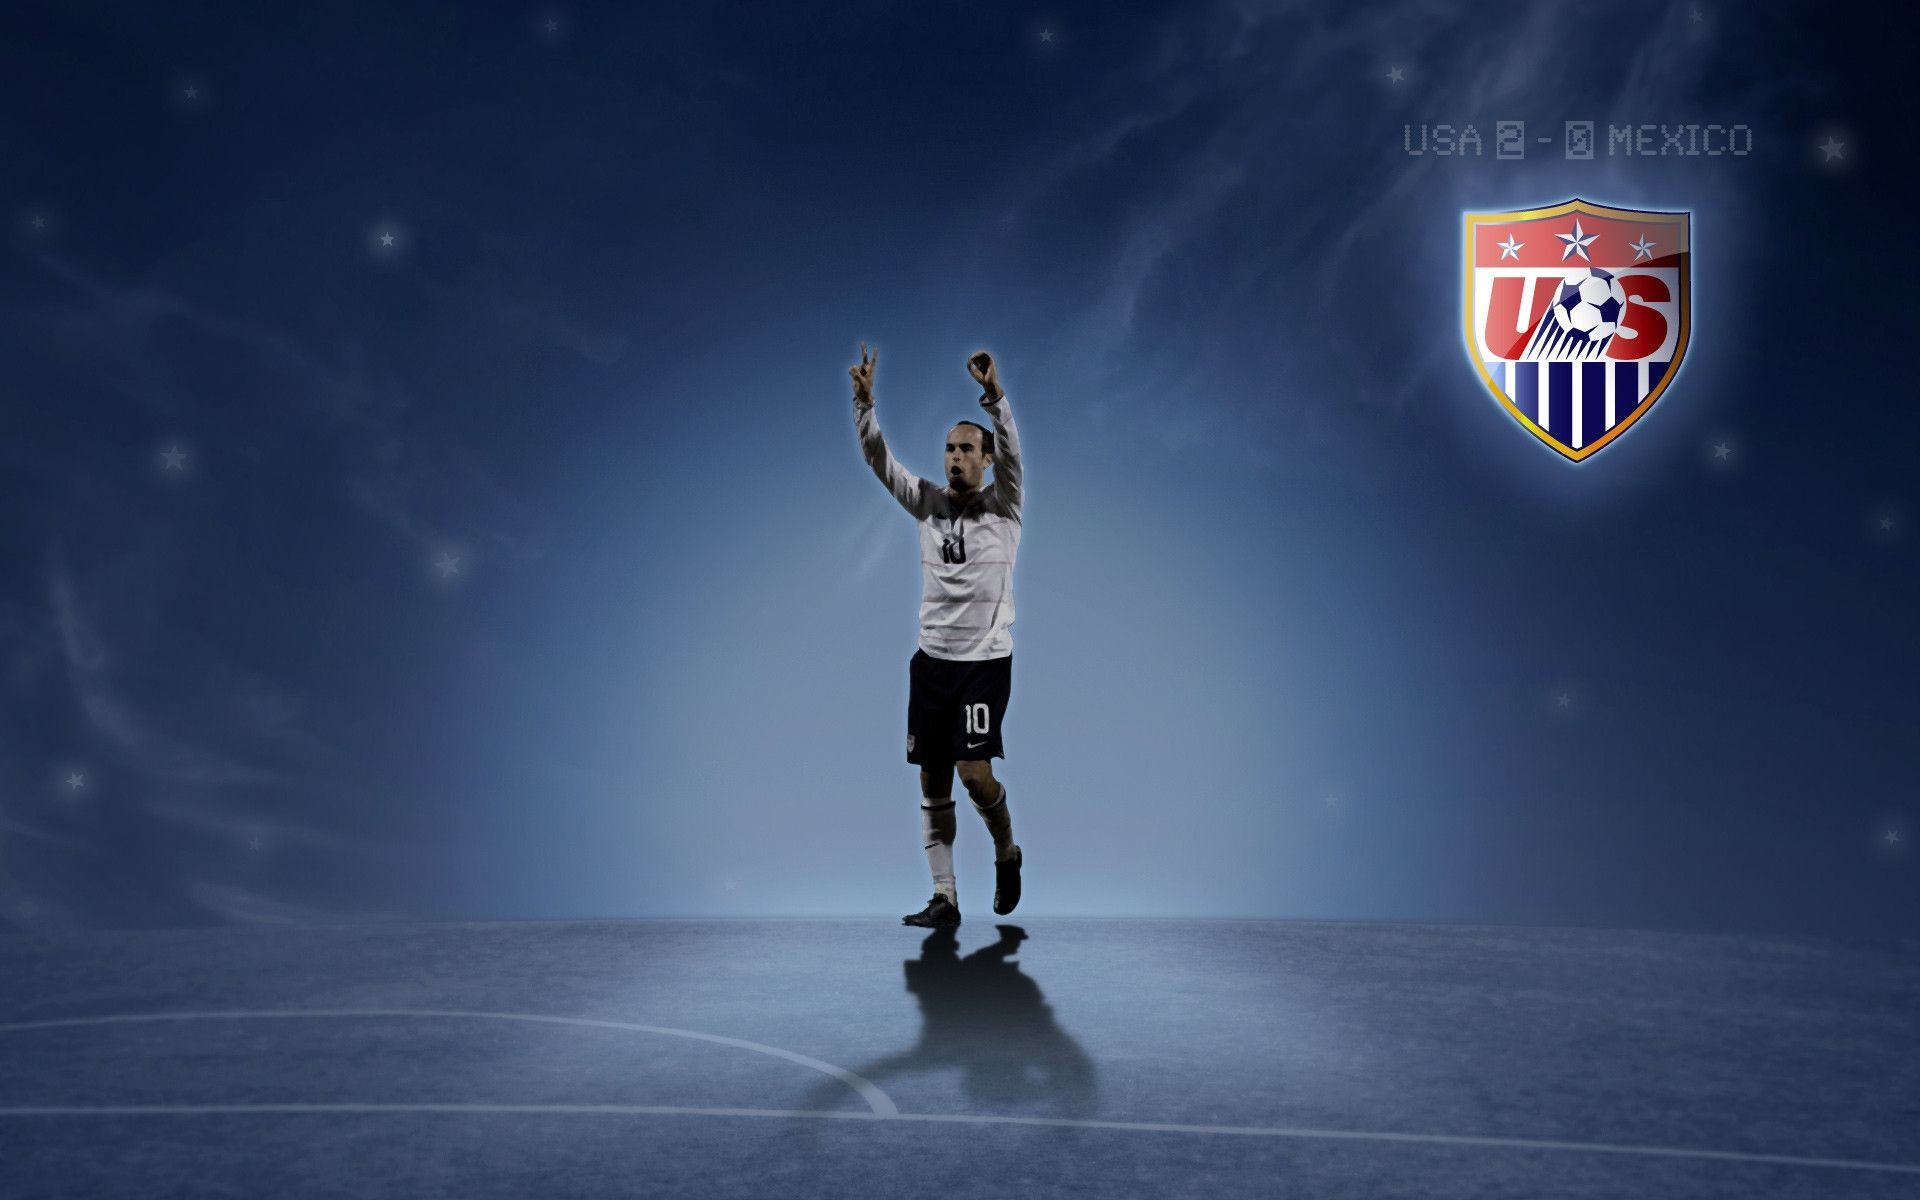 Soccer wallpaper desktop